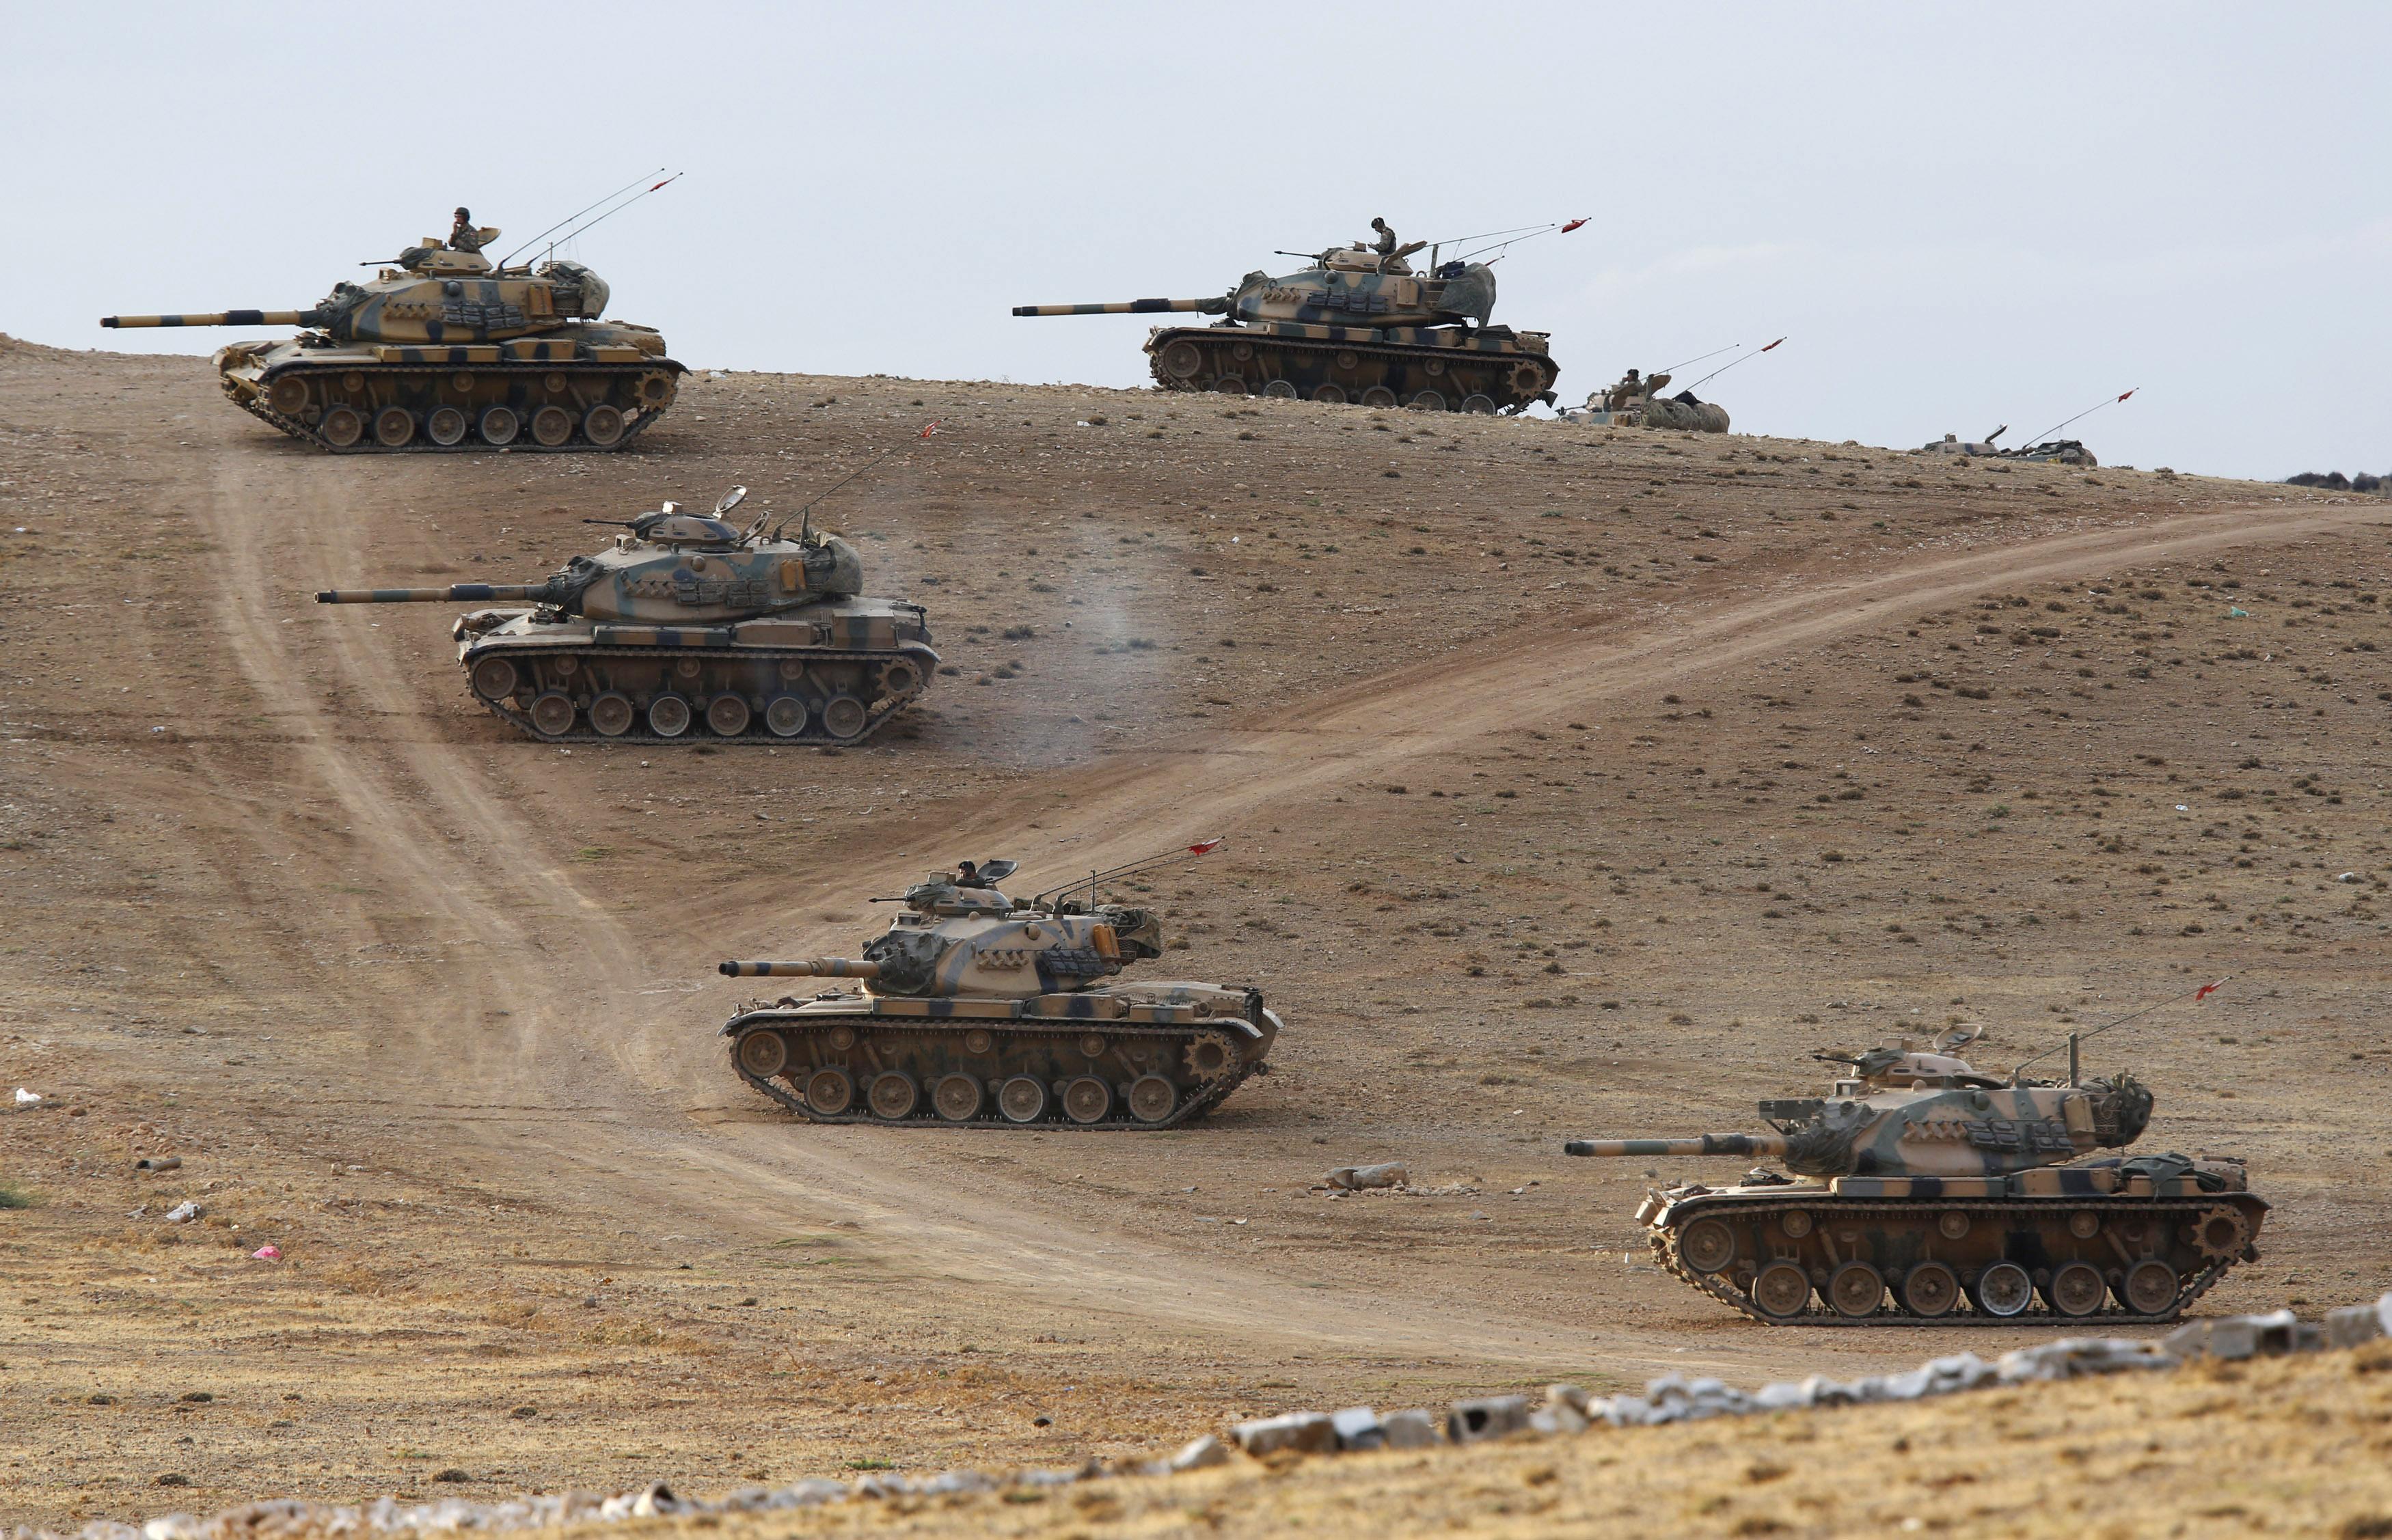 Turkey begins operation in Syria to establish buffer zone: Report